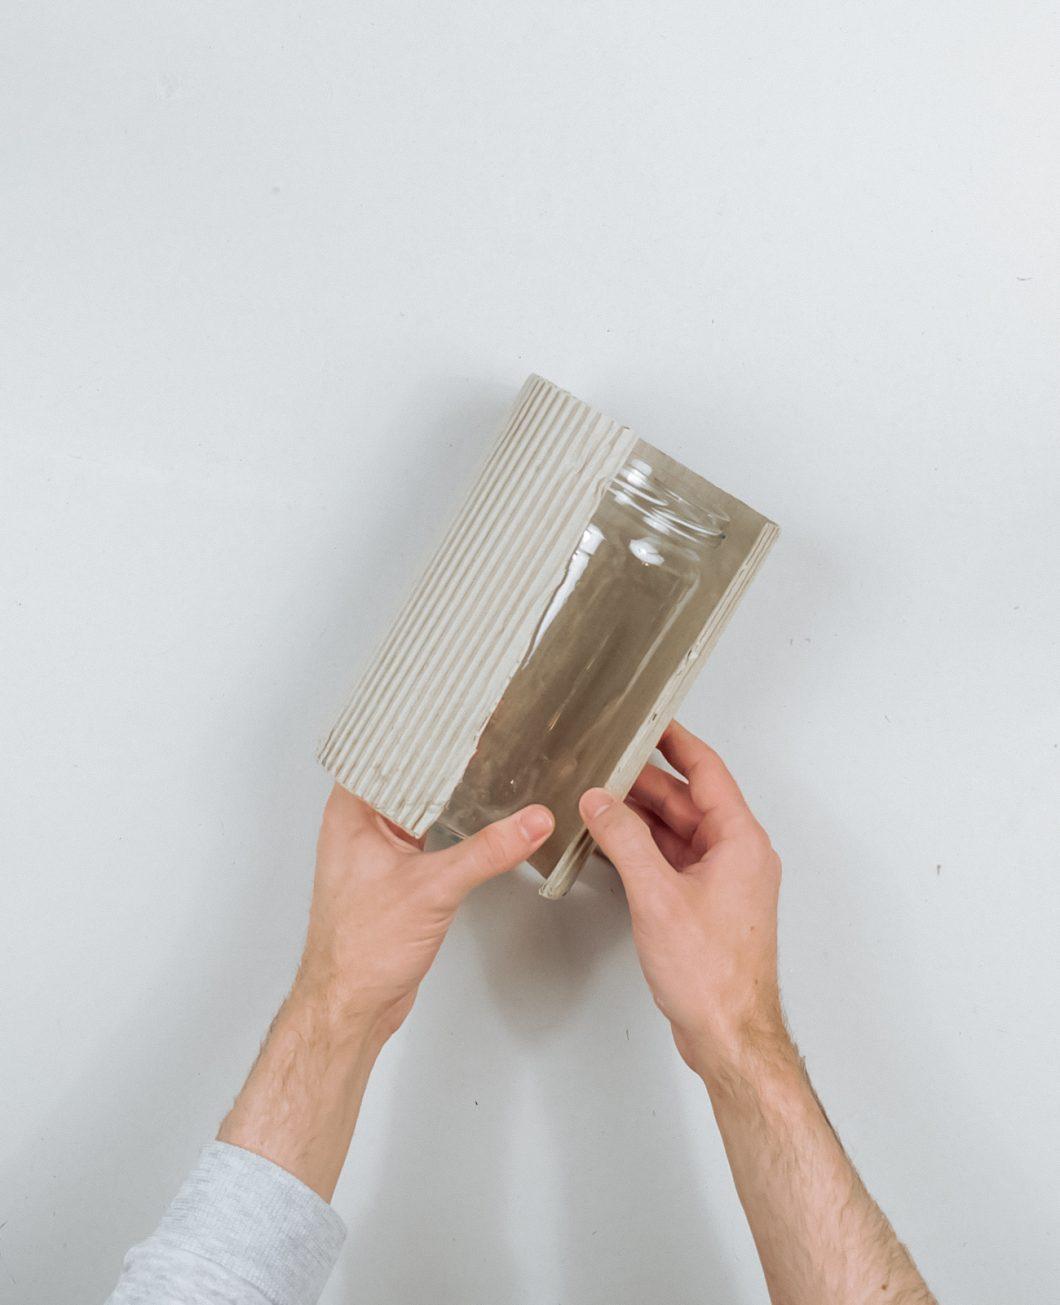 vase carton strie gaufre terracotta tuto diy etape 6